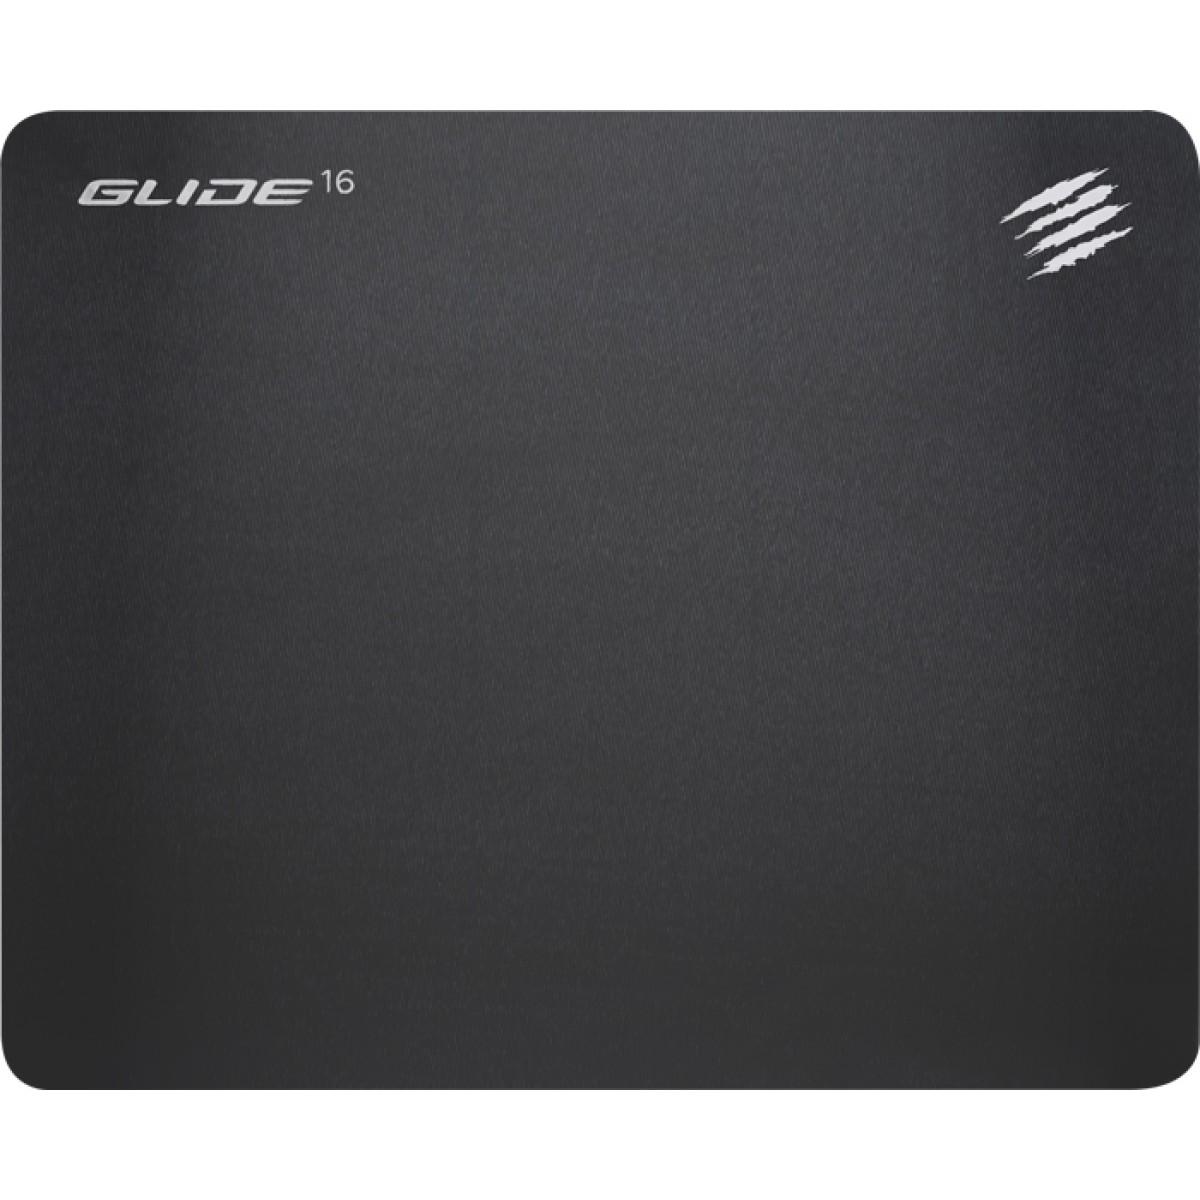 Mousepad Gamer Mad Catz Glide 16, Médio, Black, SGSNNS16BL01